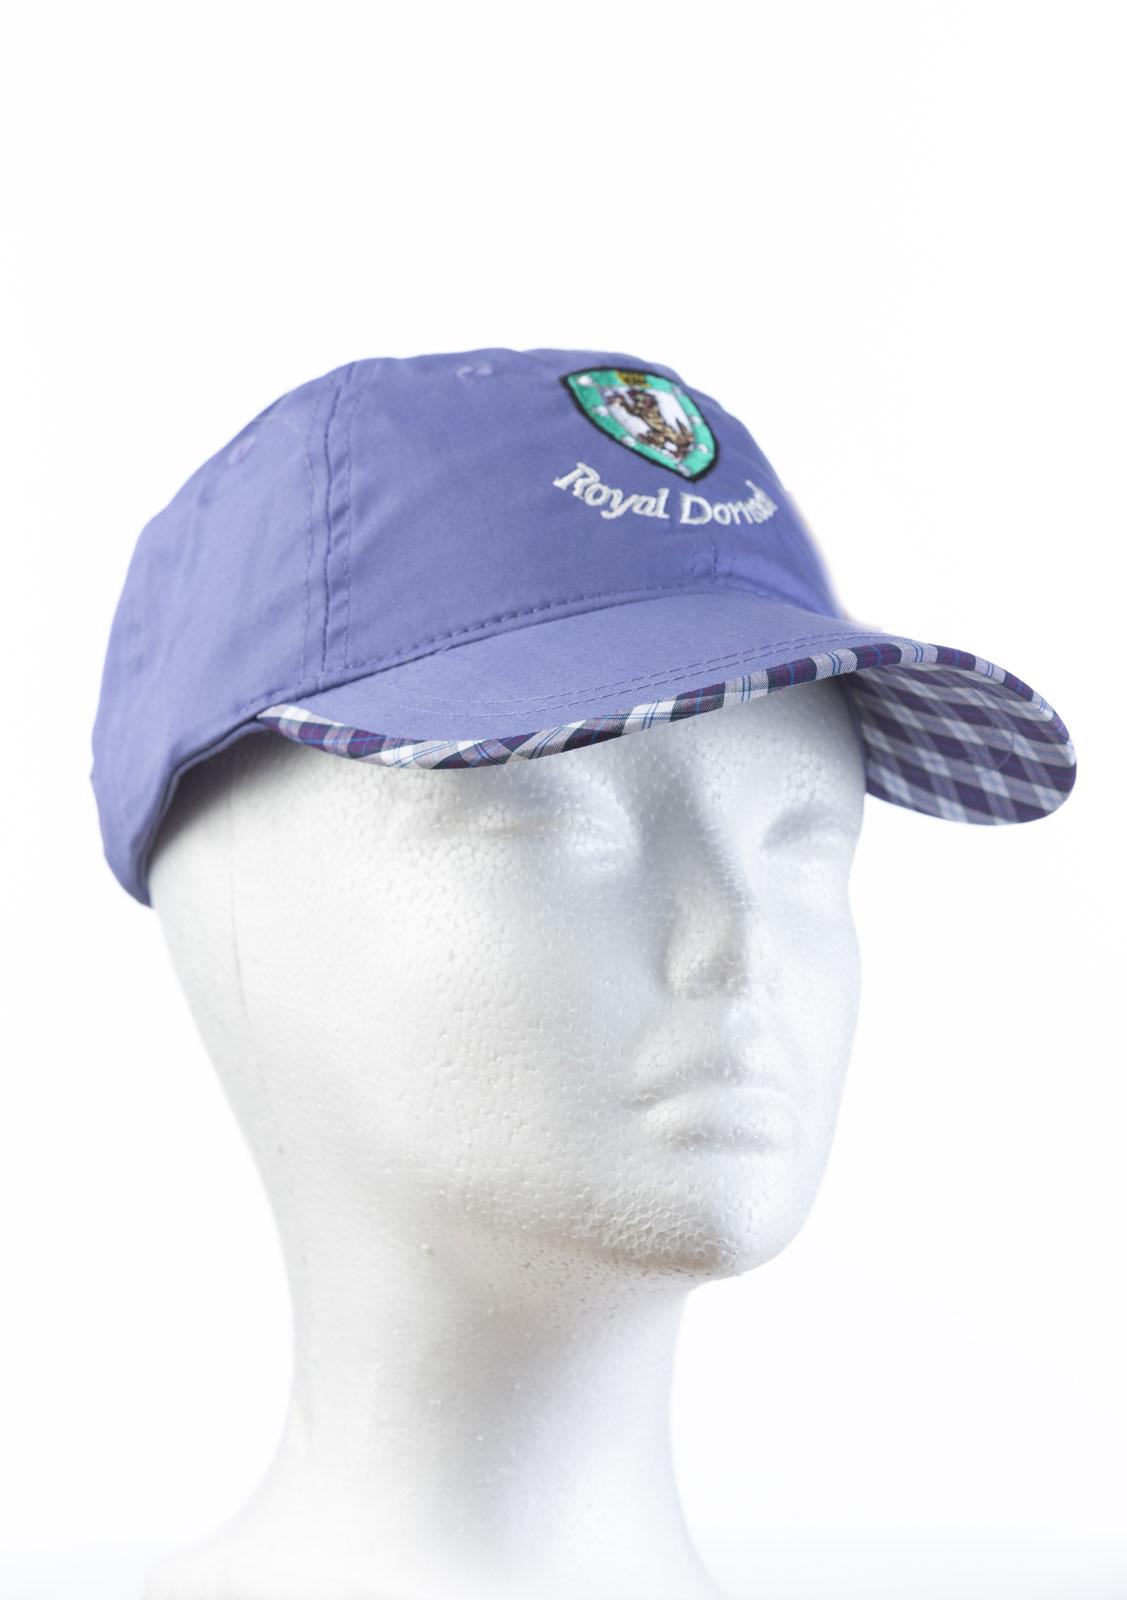 Ladies Roma Baseball Cap Royal Dornoch Pro Shop